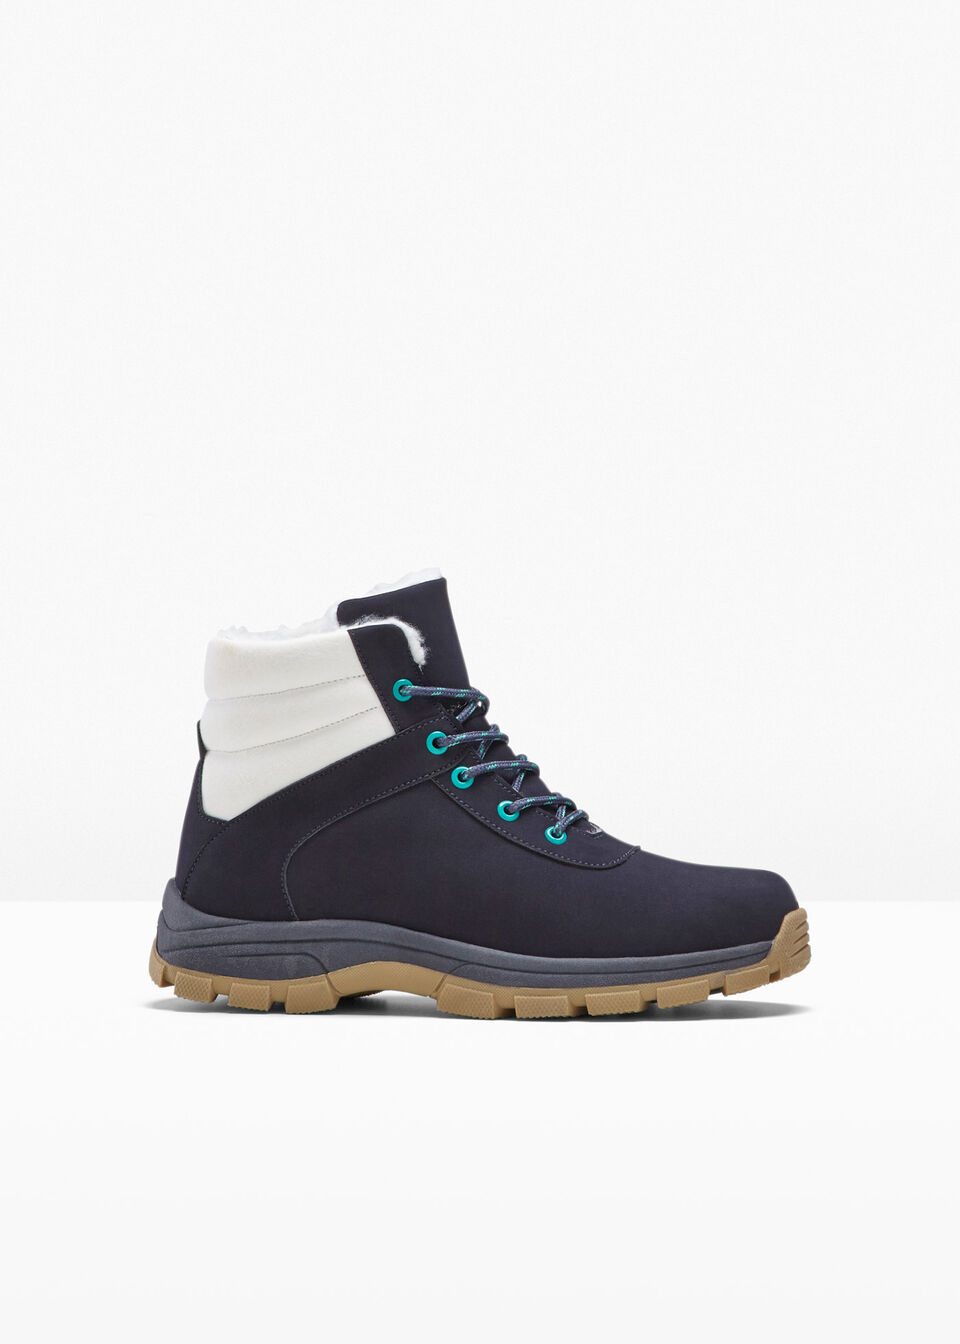 Детские зимние ботинки от bonprix